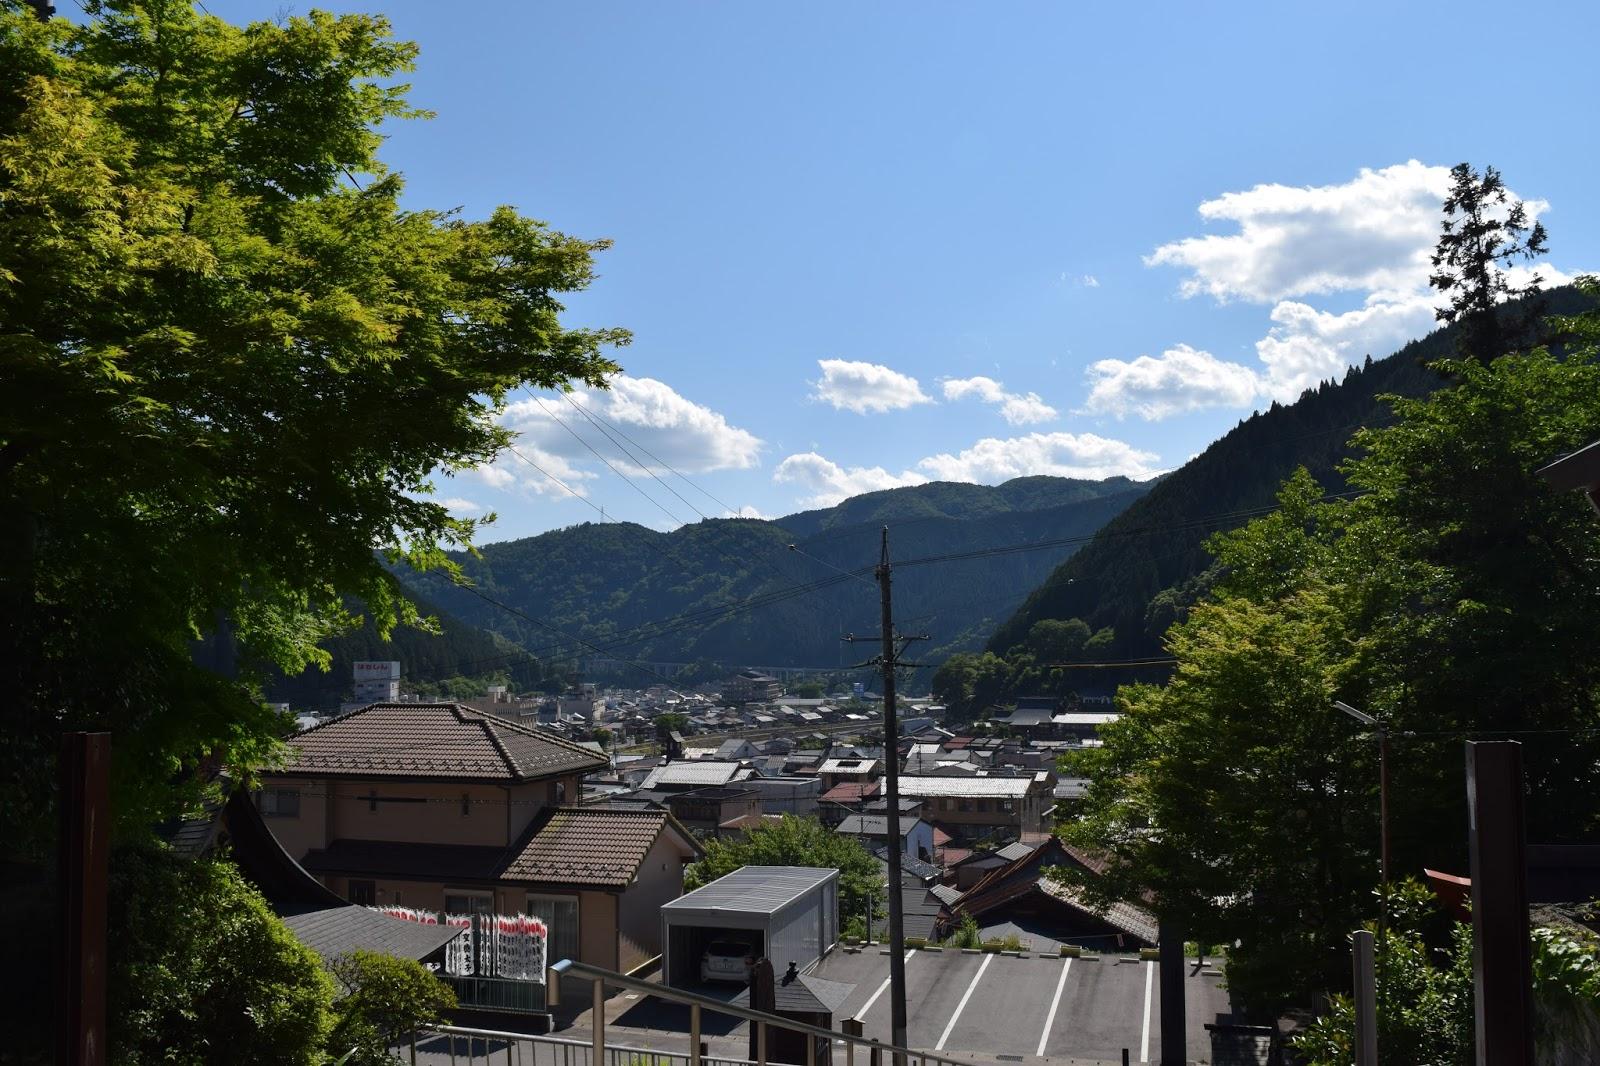 Gujou Hachiman Nagano Prefecture